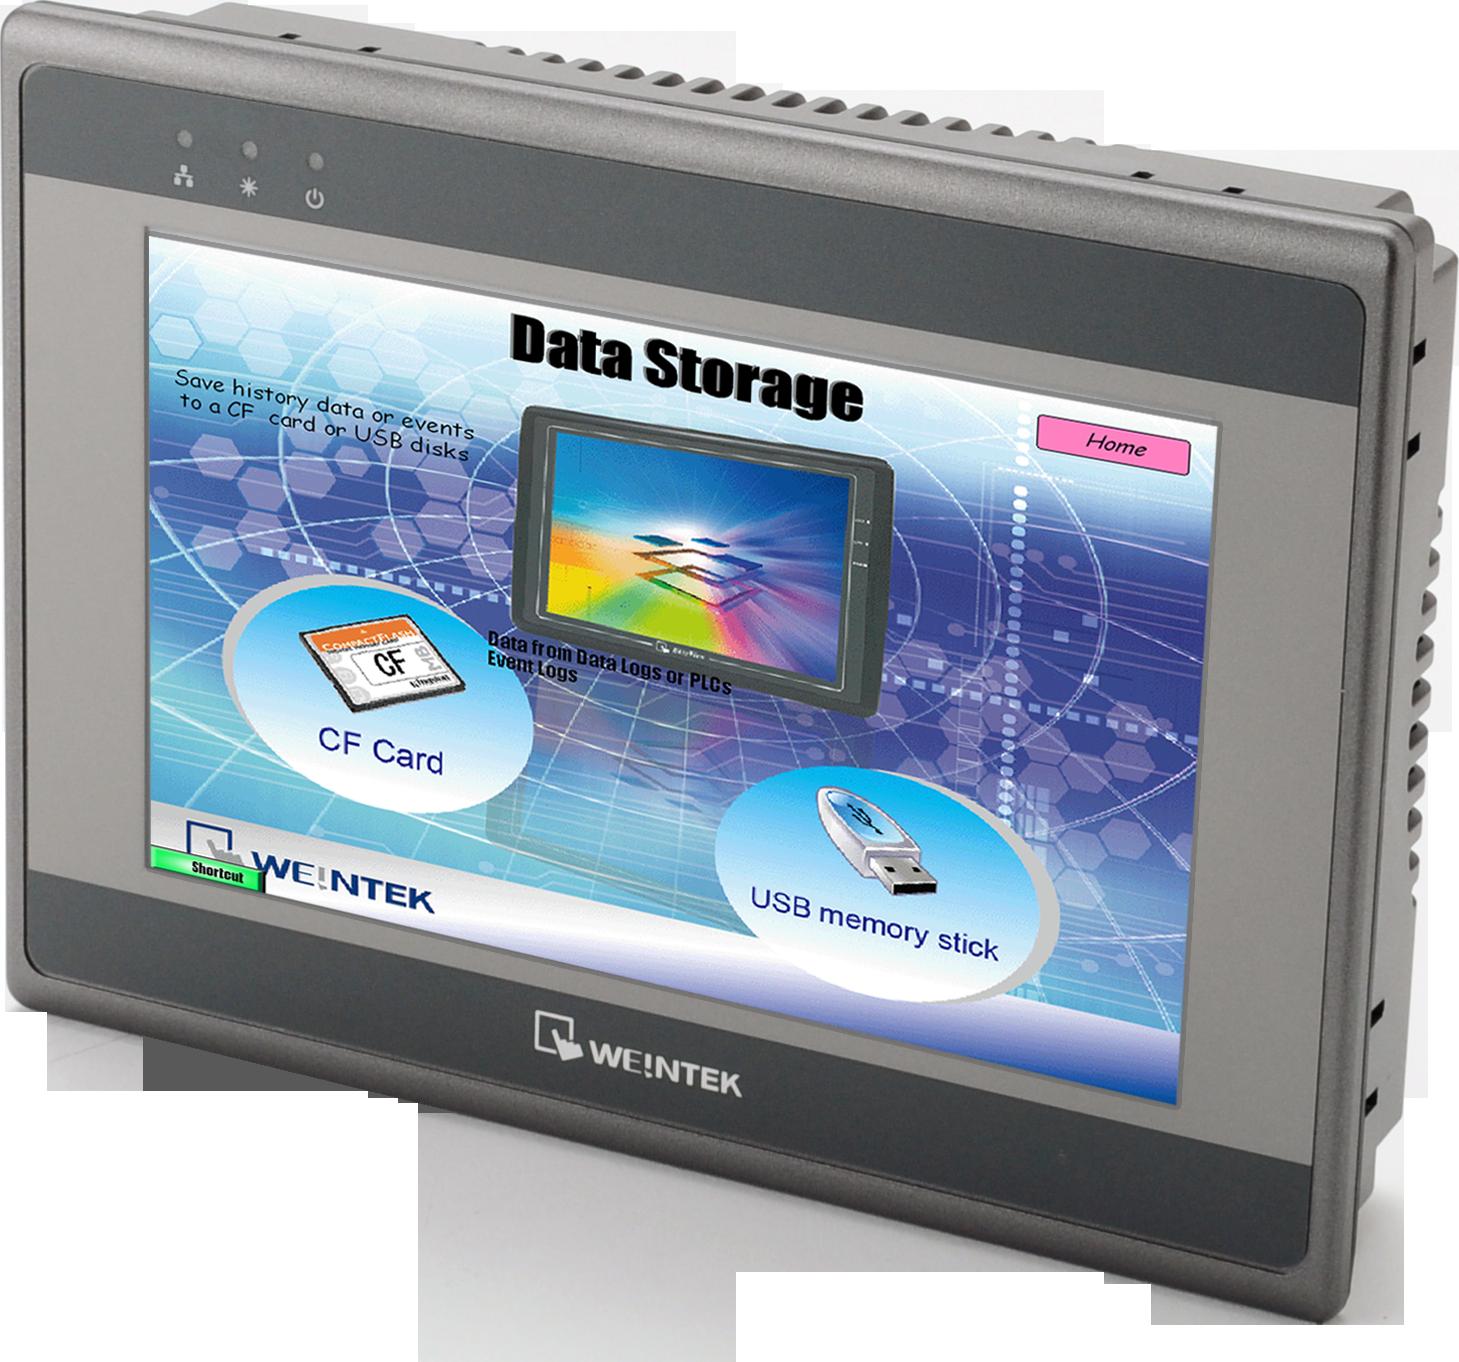 "weintek 7"" HMI HMI5070TH Rohtek with UL certificate, 600 MHz CPU and Ethernet port"